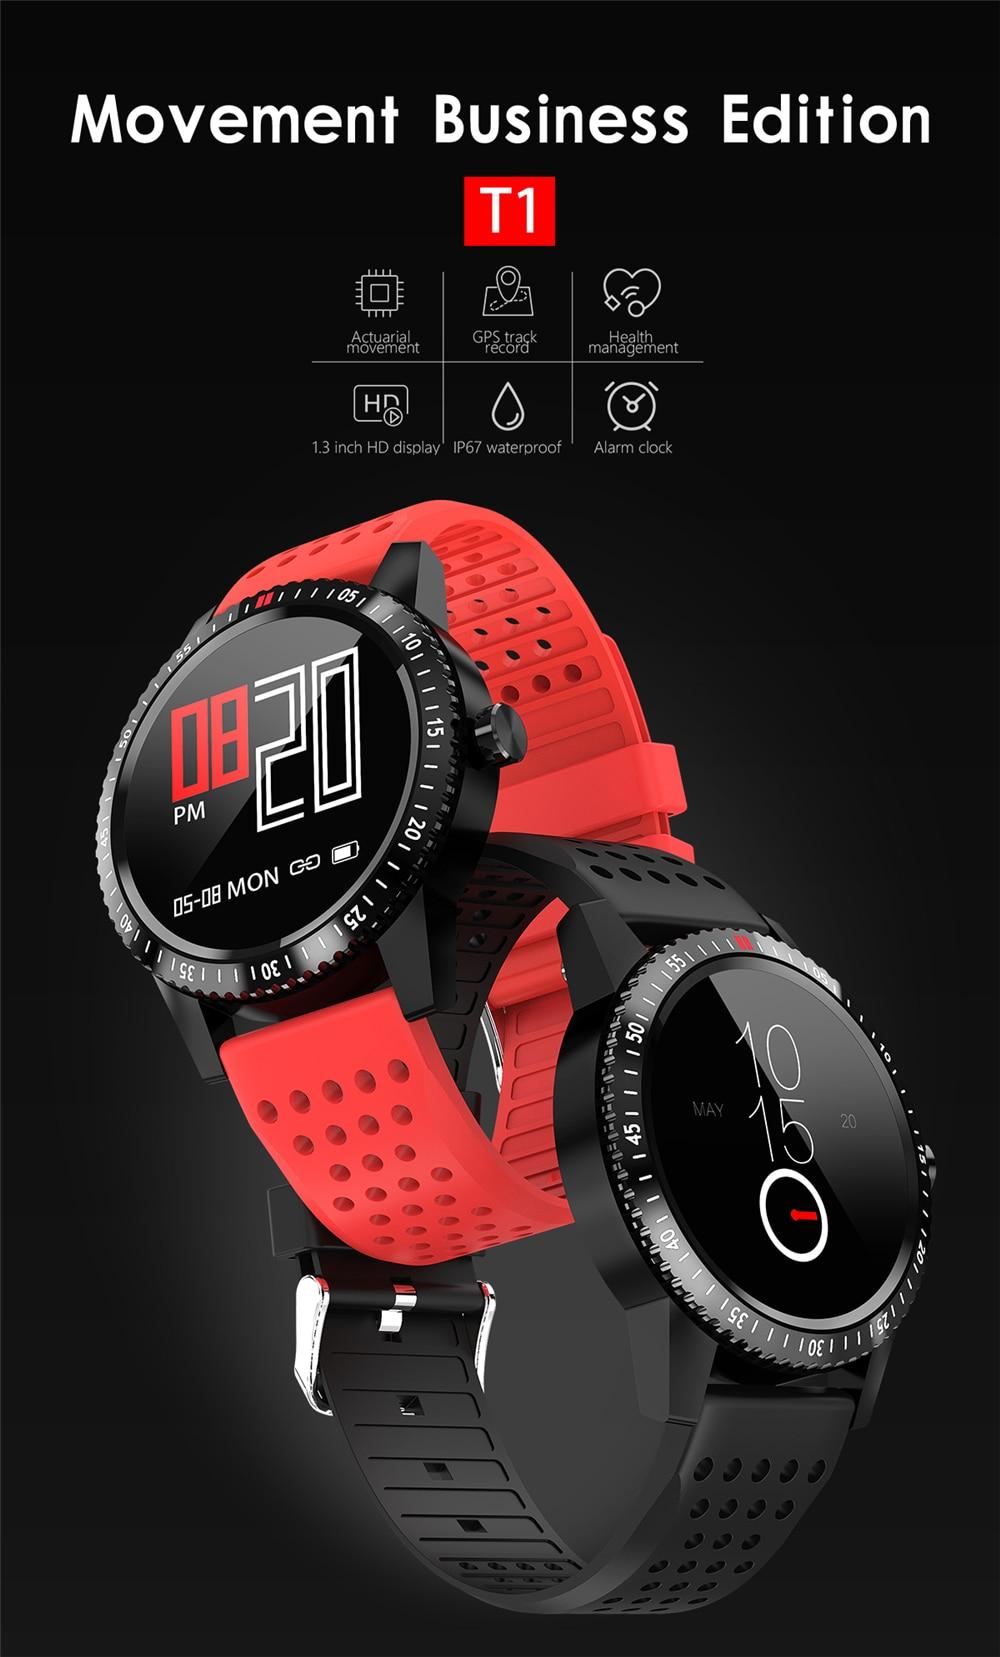 H Band T1 Smart Watch Fitness IP67 Waterproof Blood Pressure GPS Sport  Fitness Tracker Heart Rate Smartwatch For Man Women